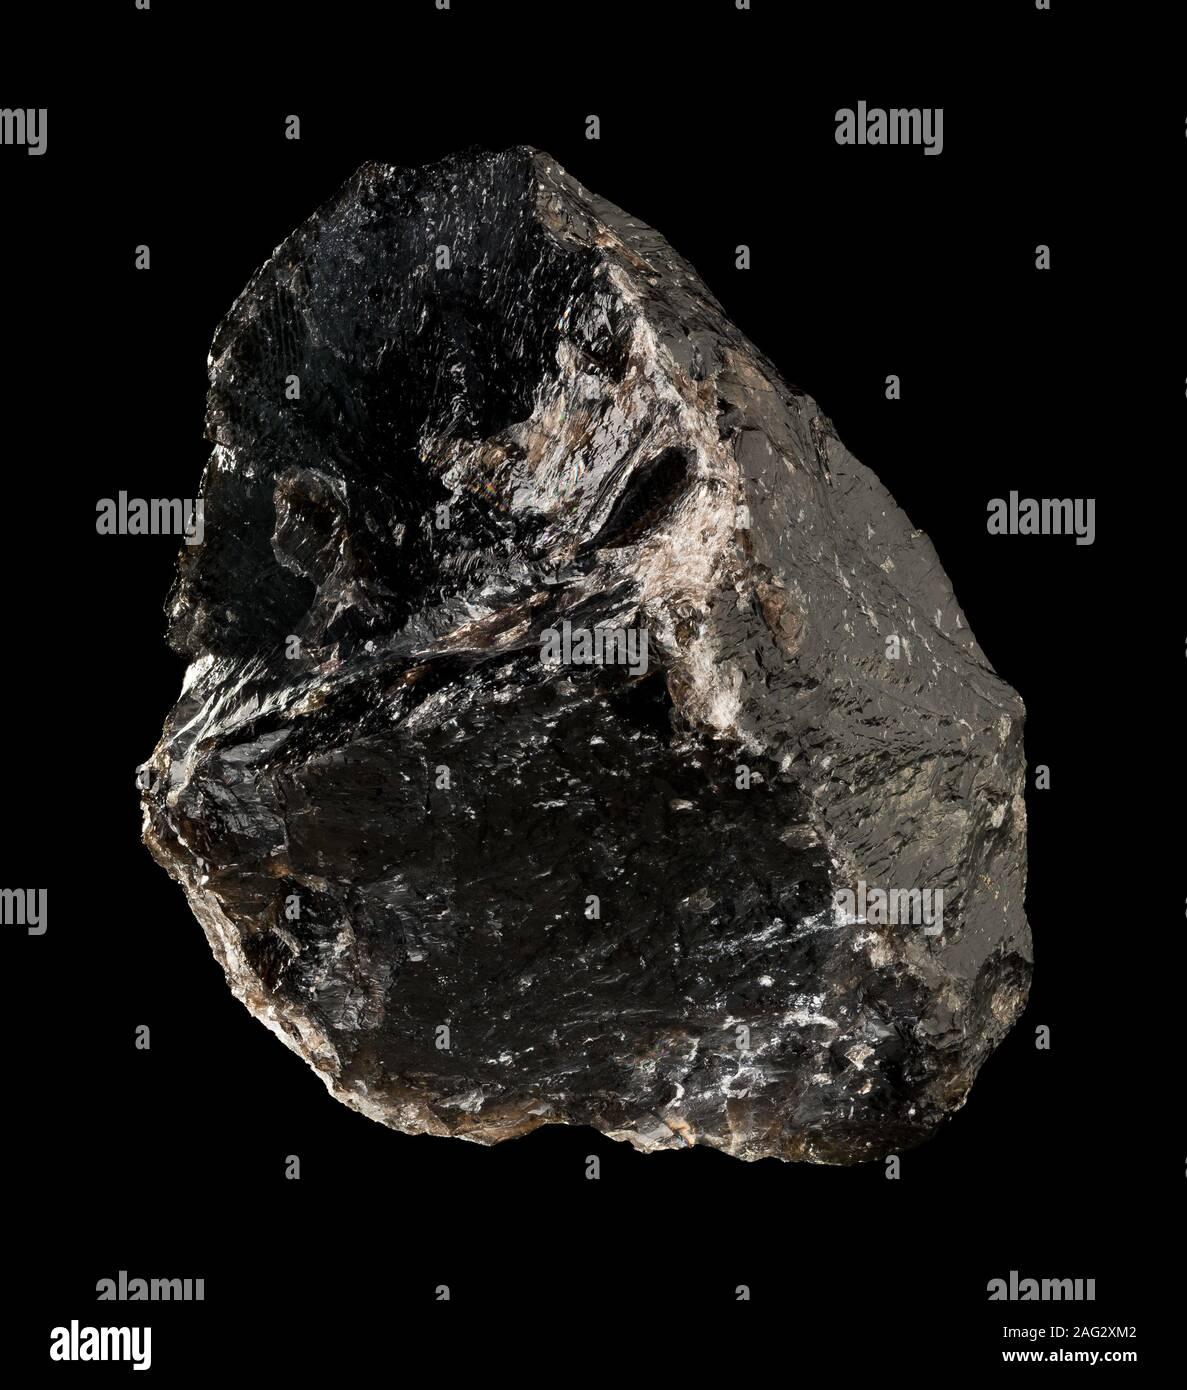 Smokey quartz crystal (SiO2) from Brasil isolated on black background Stock Photo